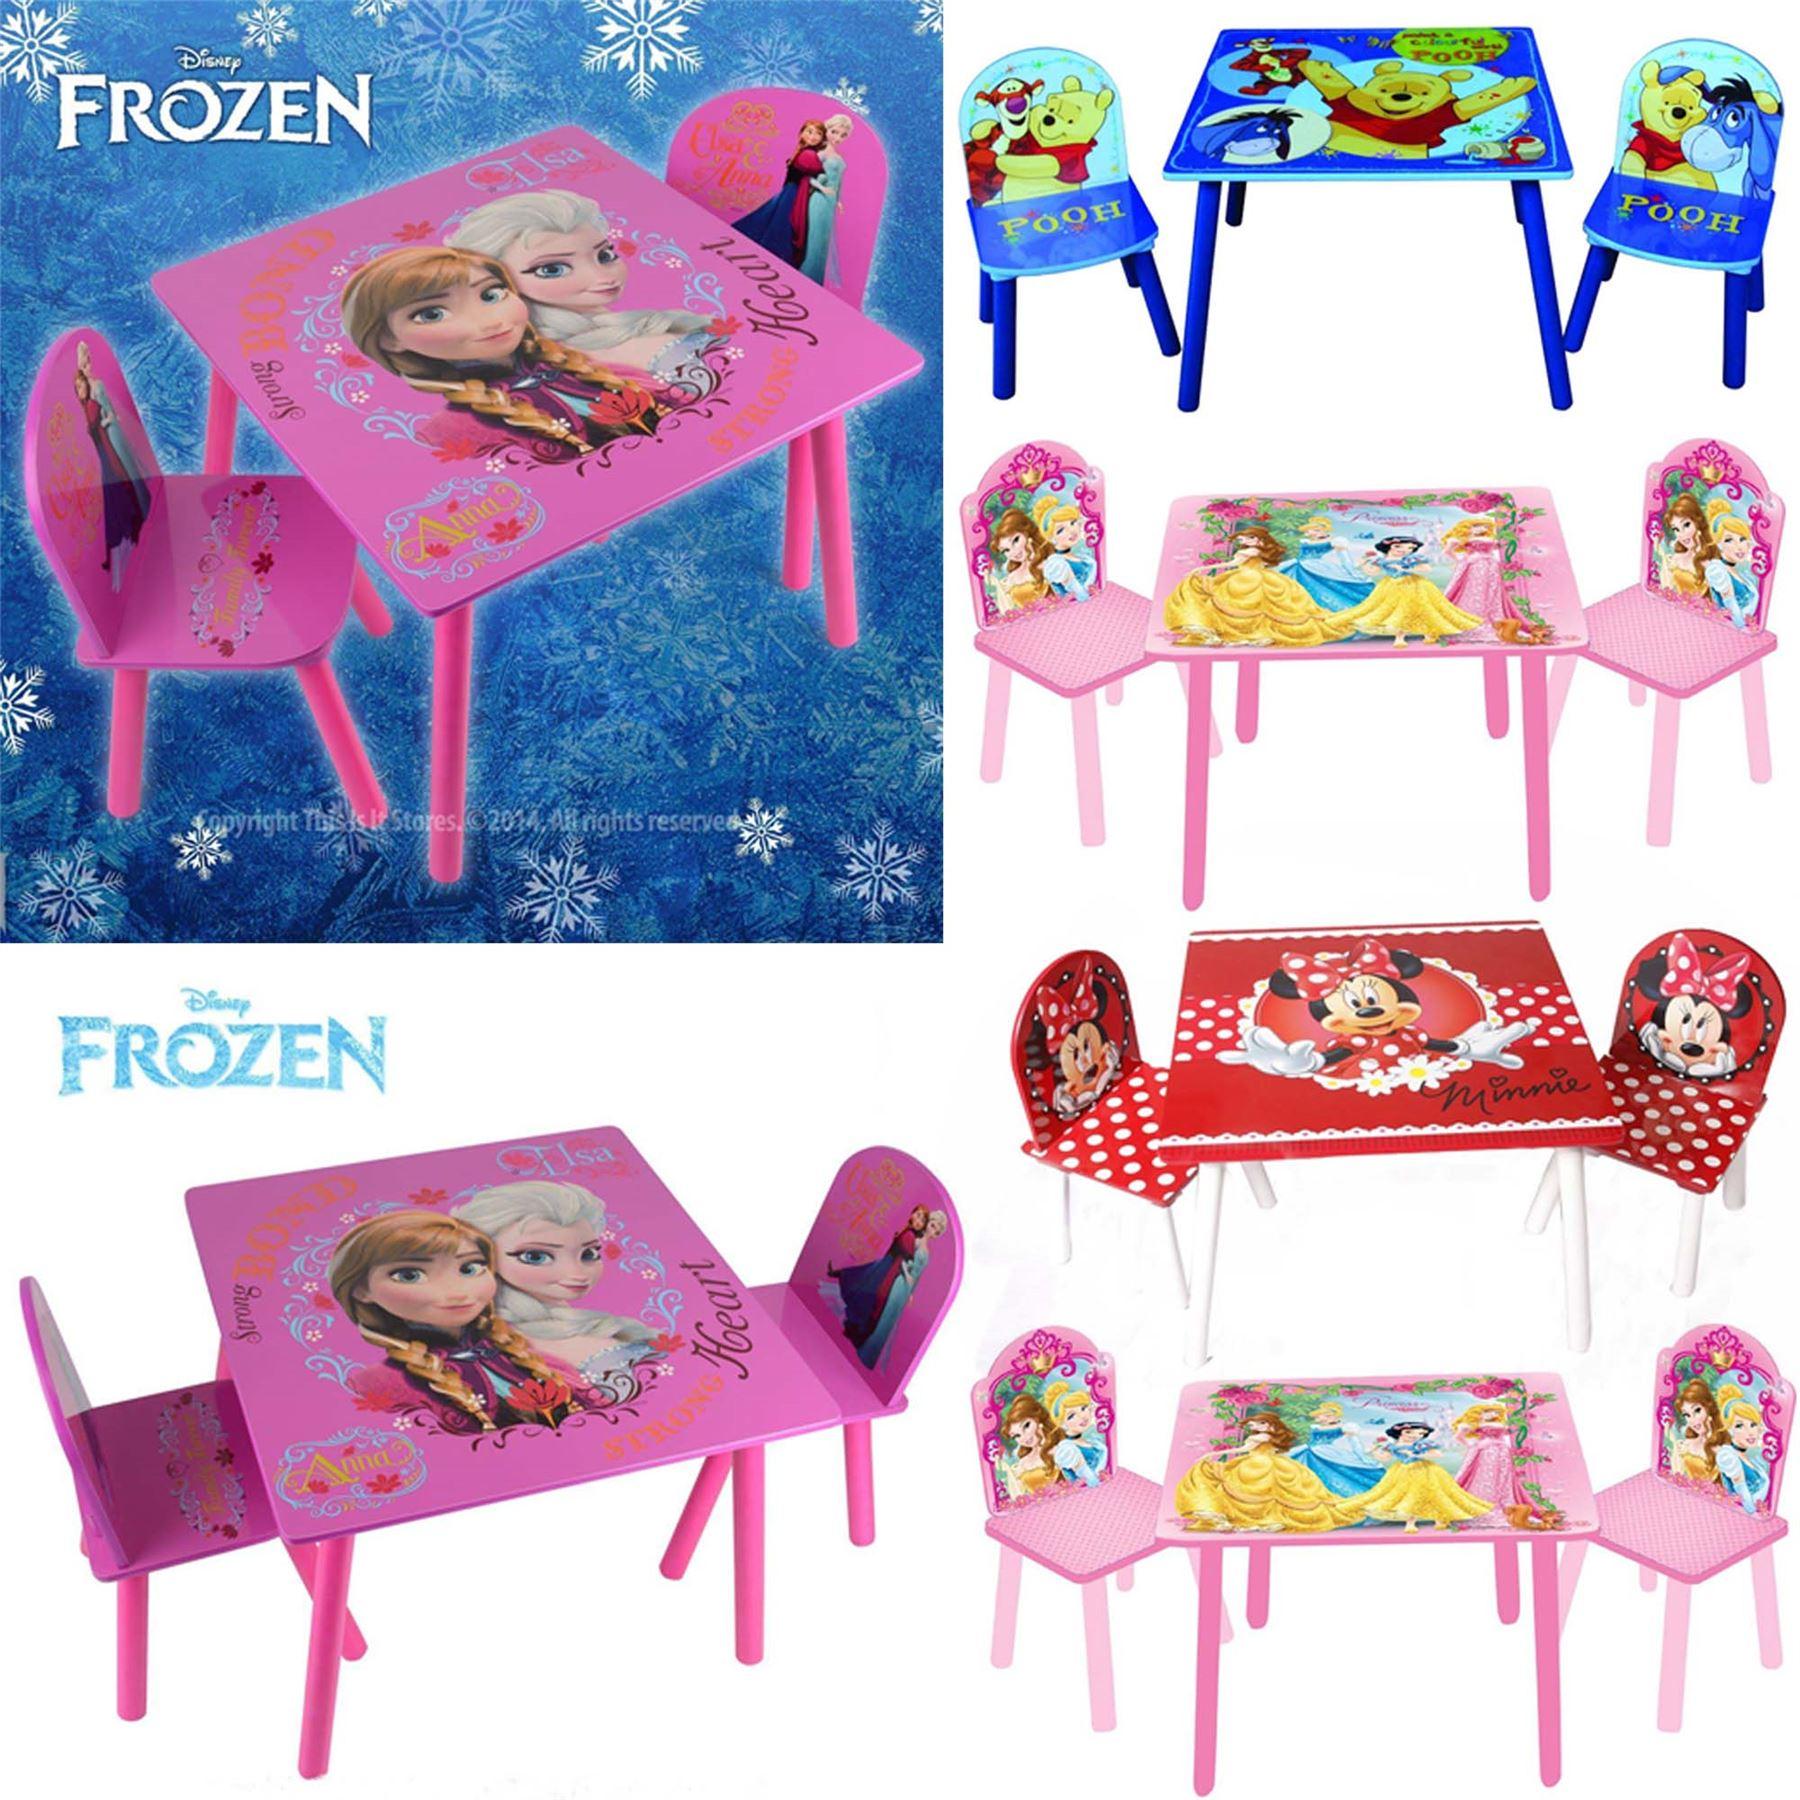 disney princess chair wayfair adirondack cushions frozen furniture table and chairs set